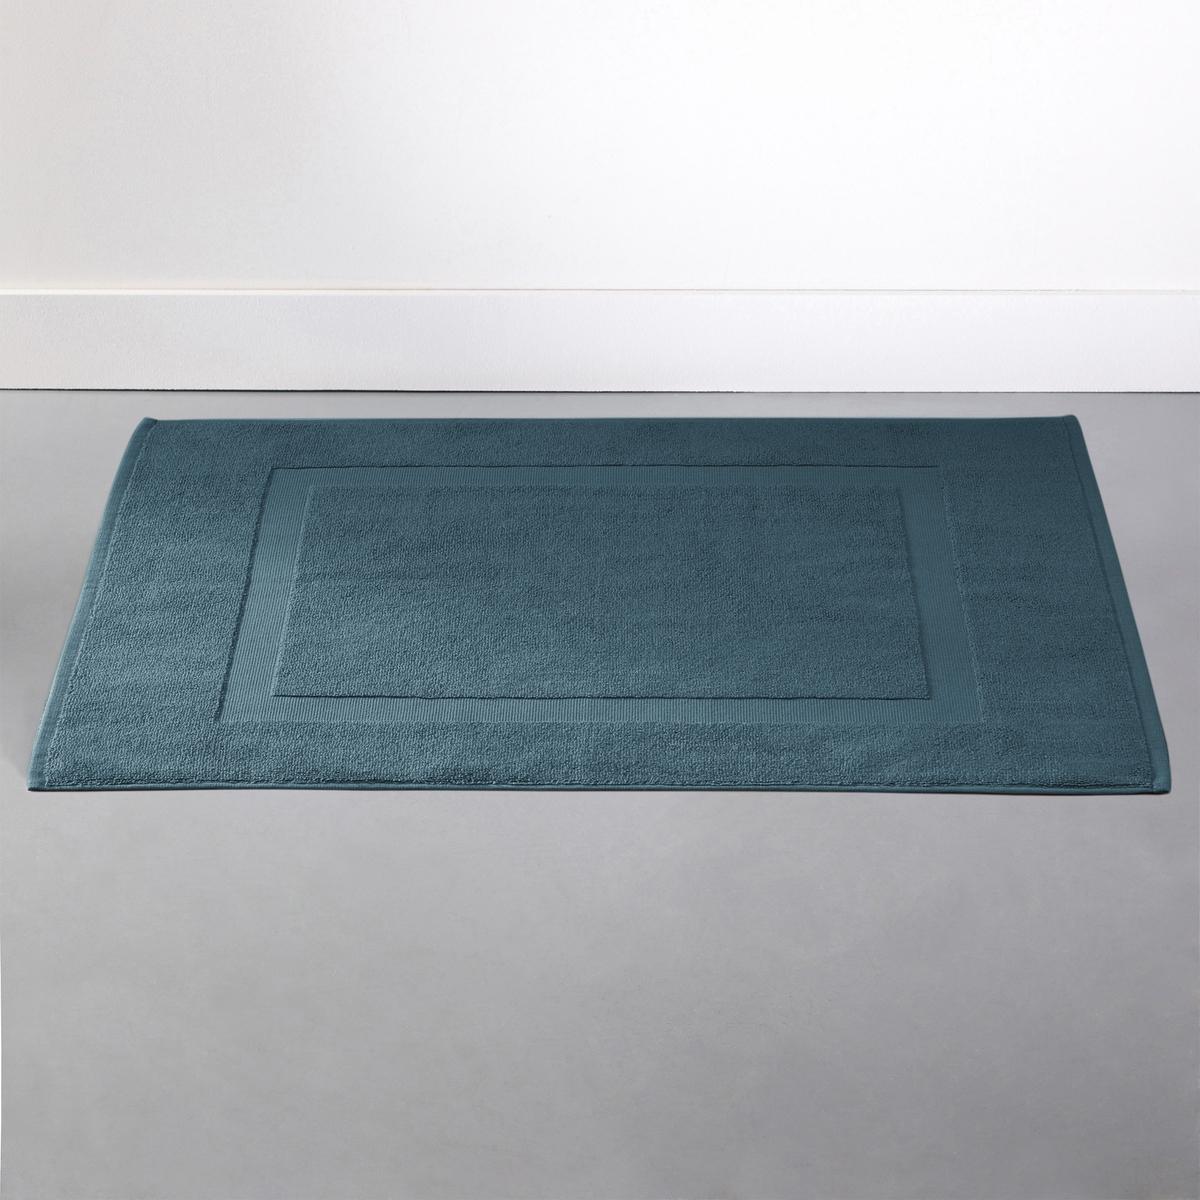 Tappeto da bagno 700 g/m²